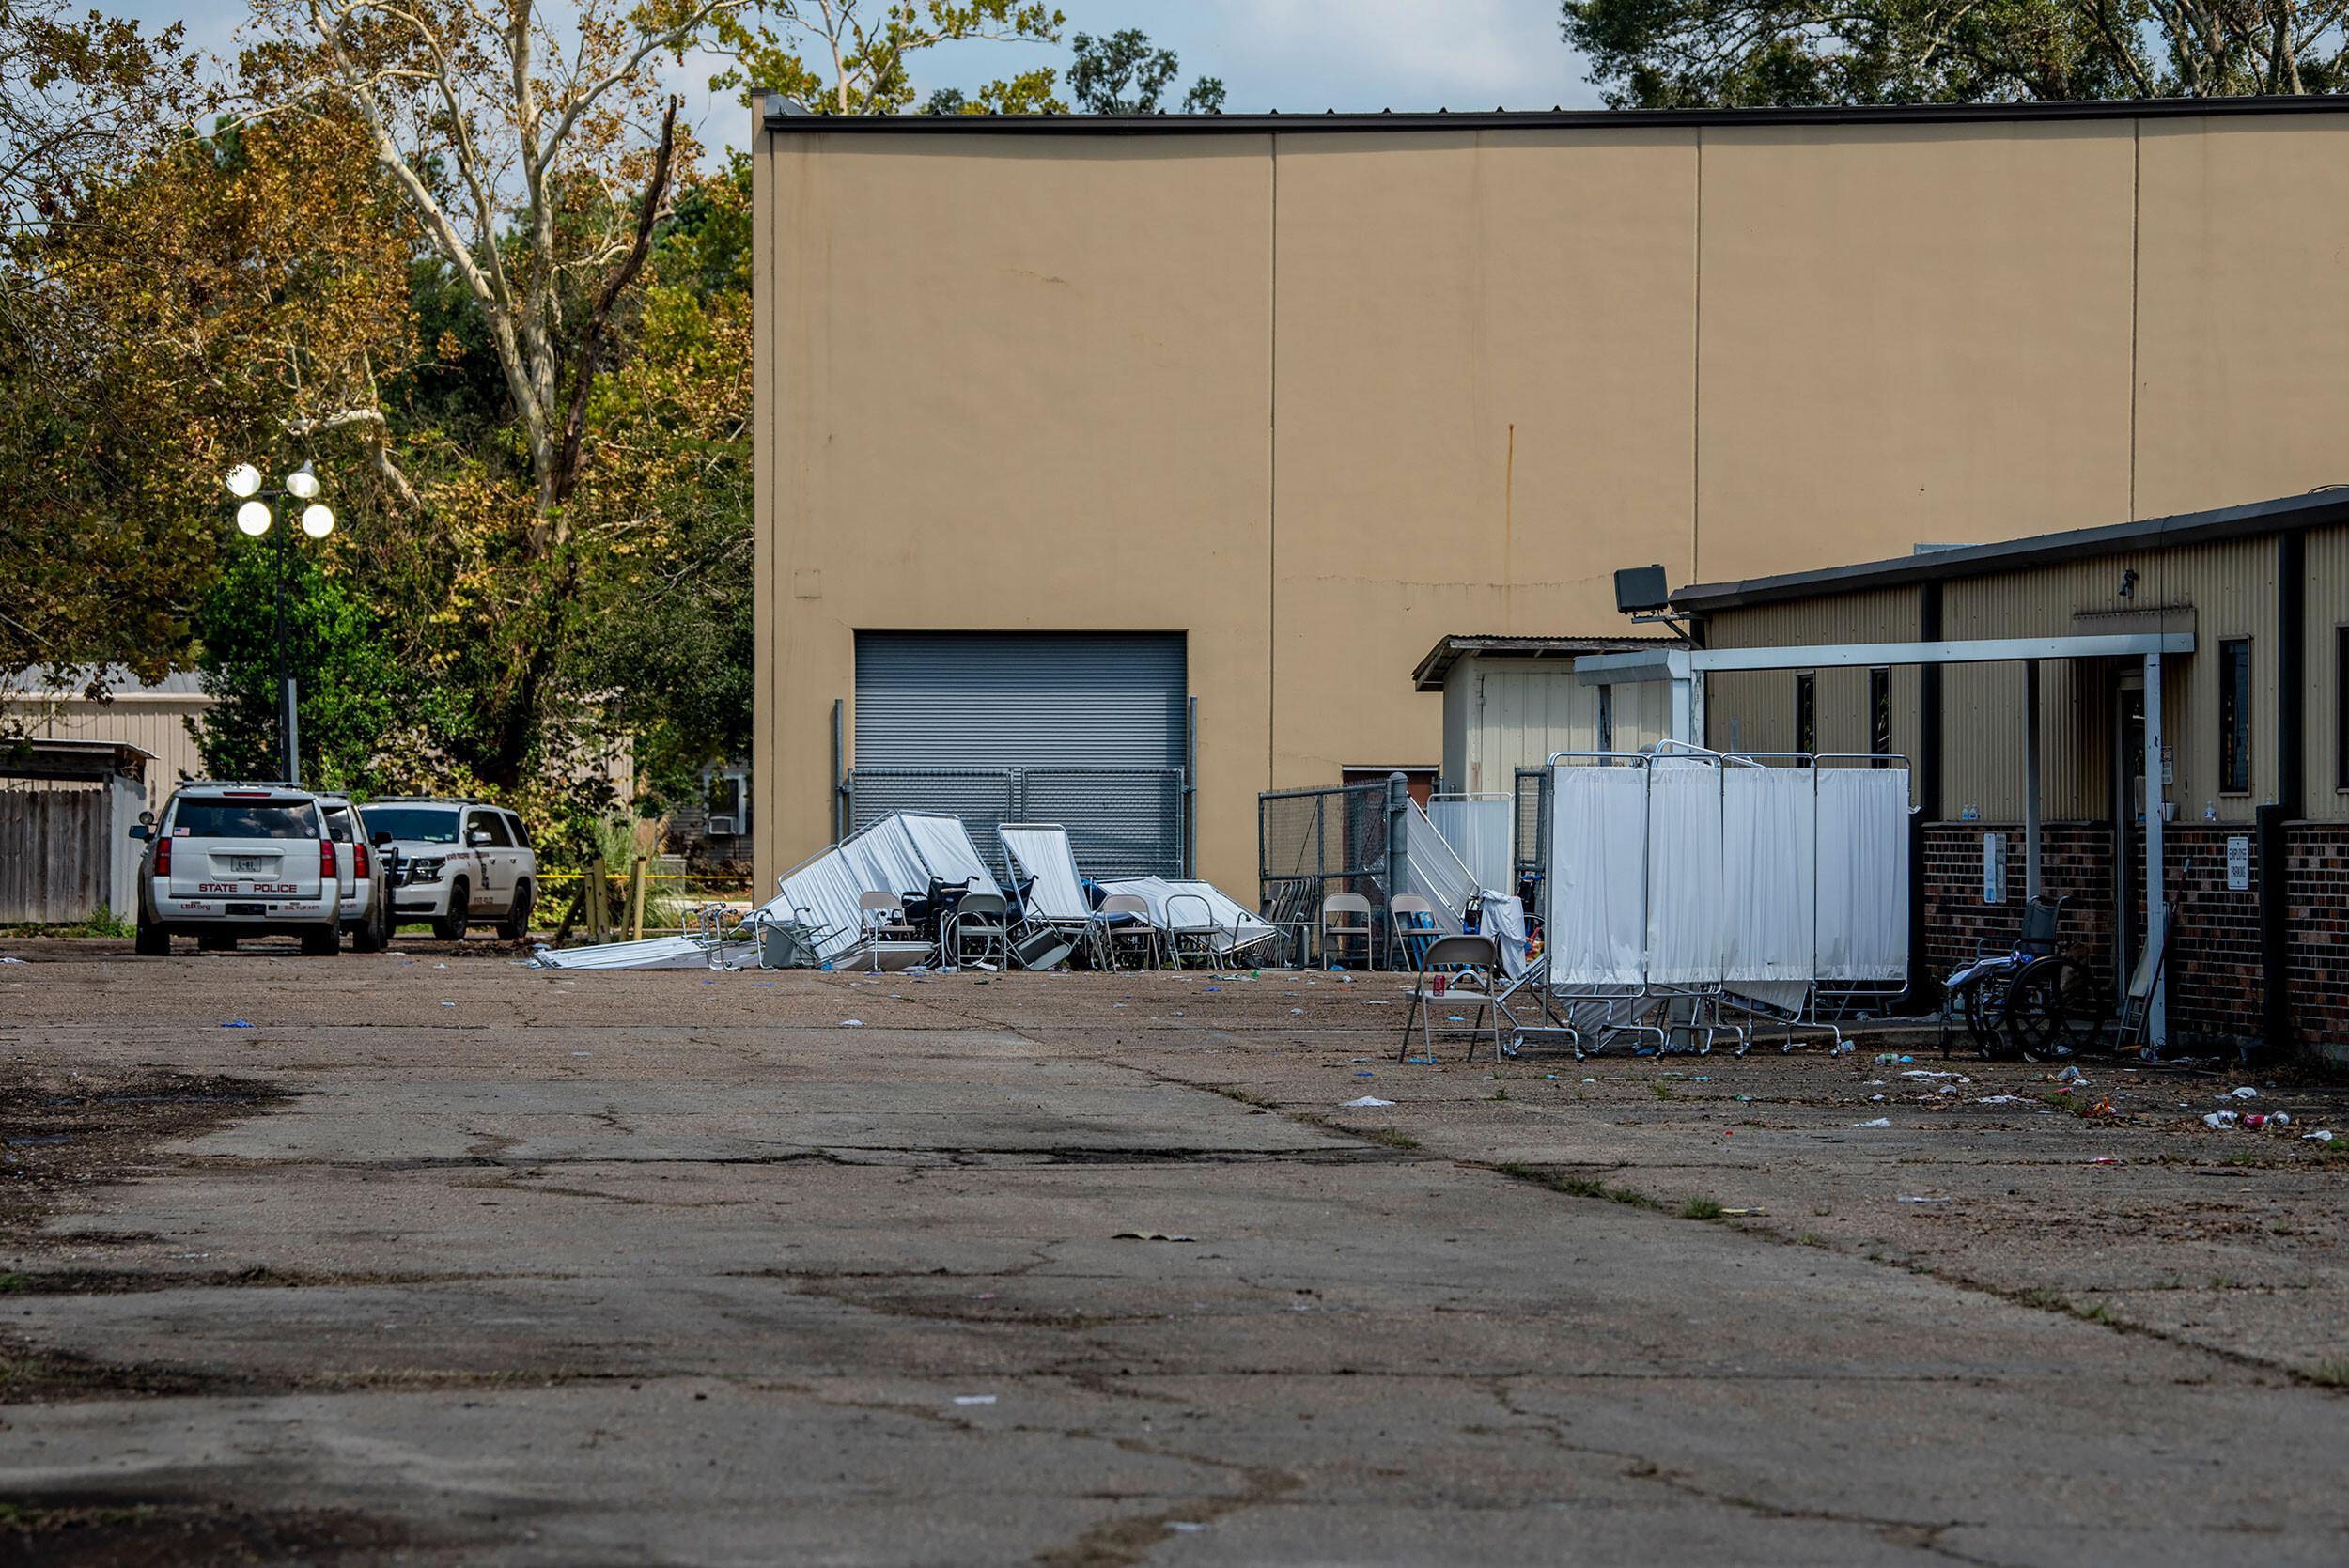 Louisiana revokes licenses of 7 nursing homes that evacuated patients to a warehouse ahead of Hurricane Ida